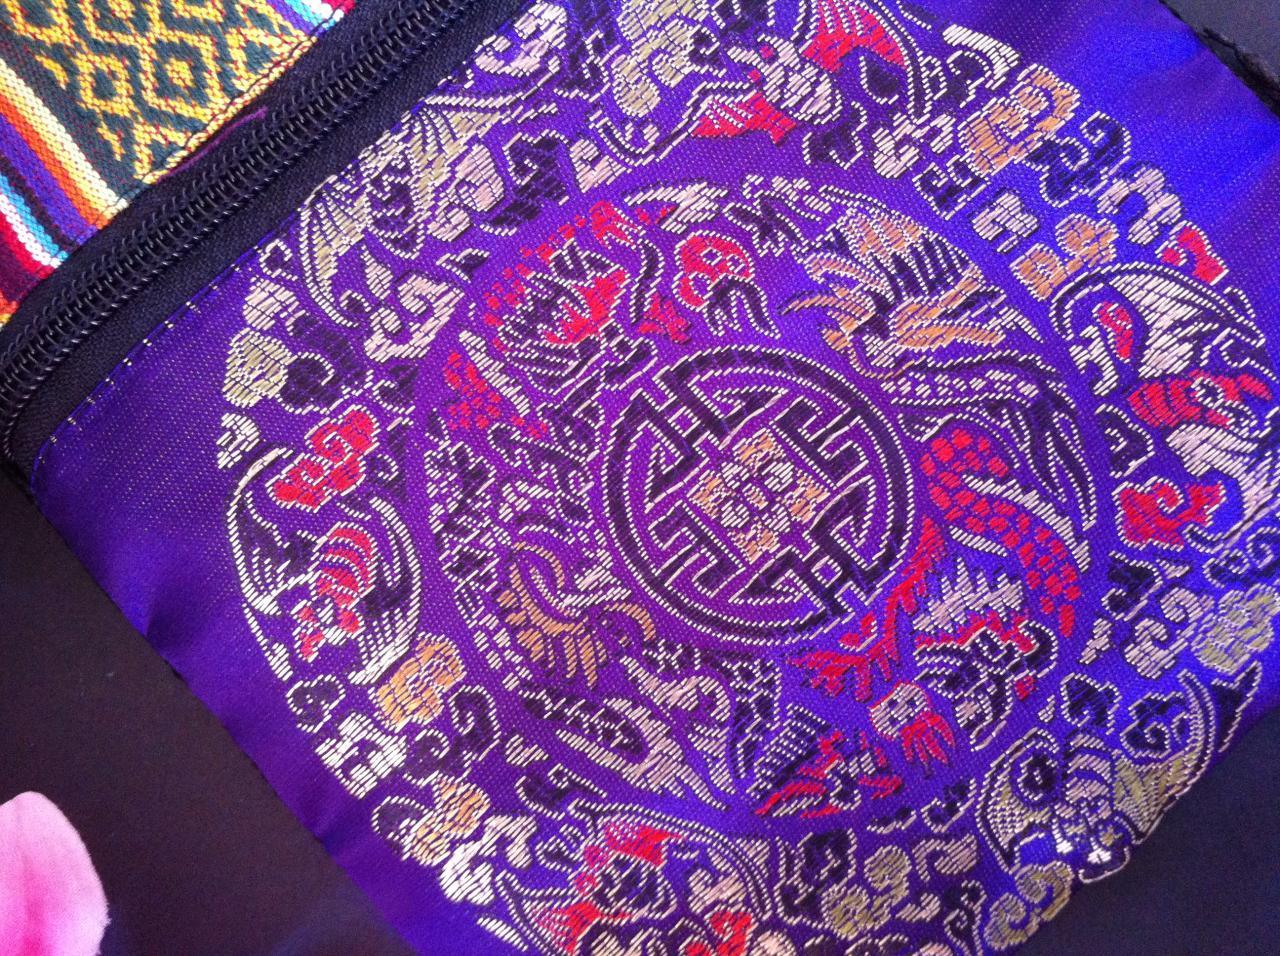 pochette-violet-1a.jpg